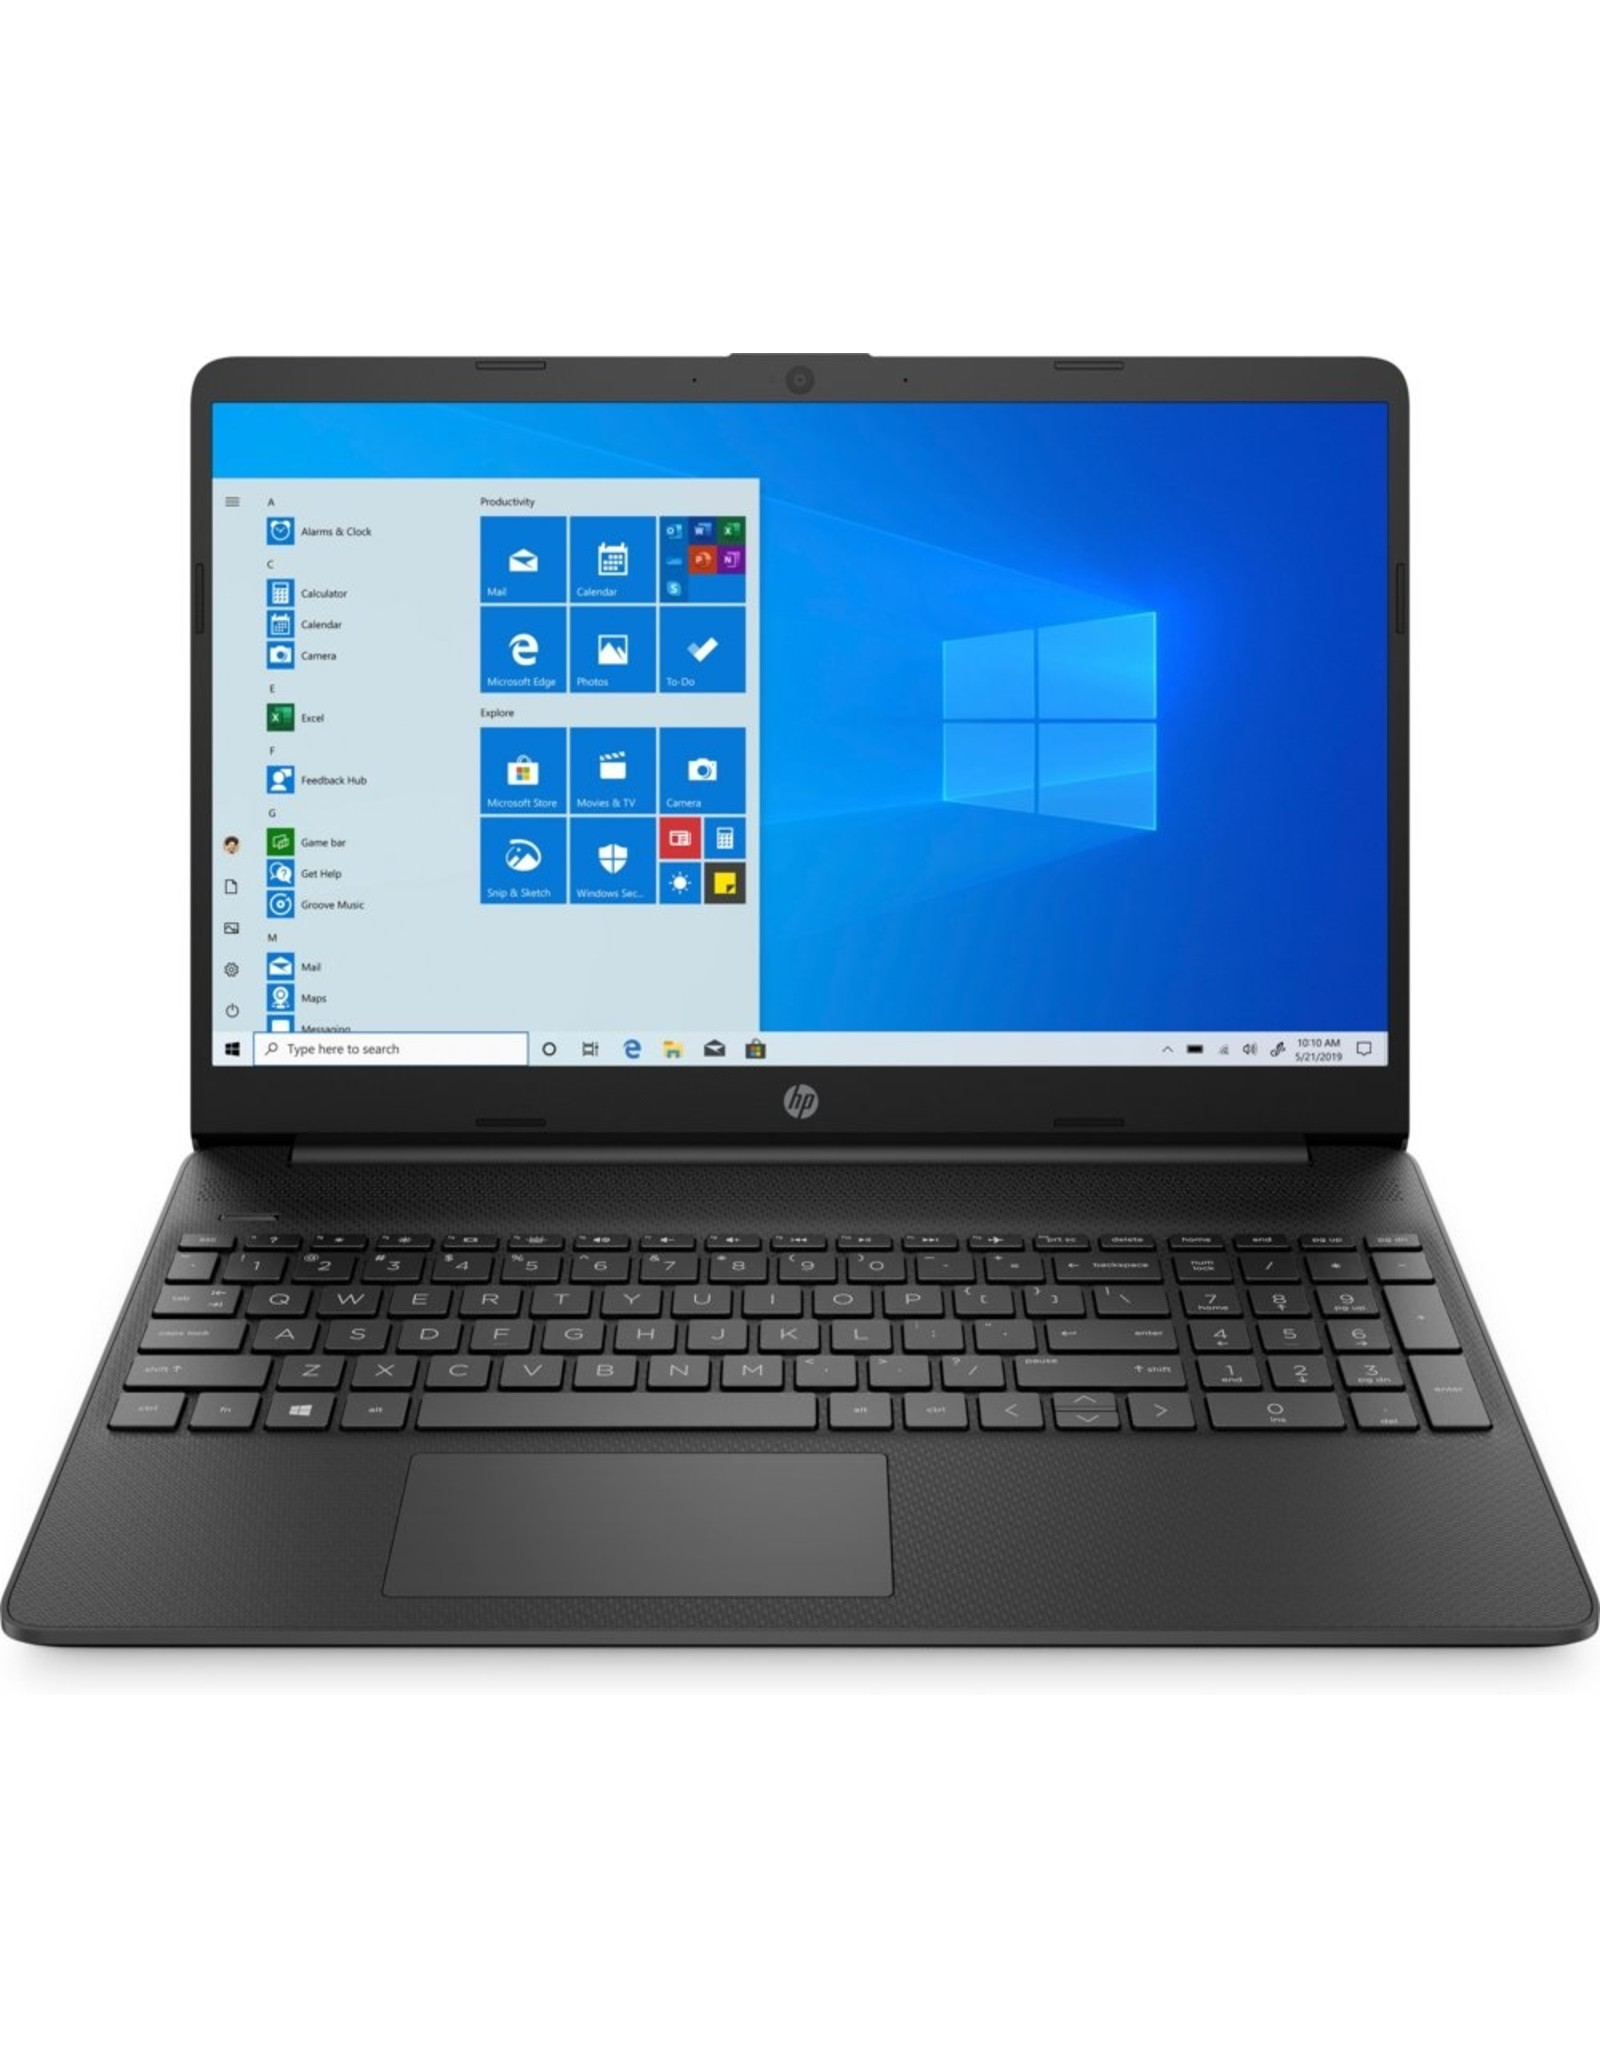 Hewlett Packard HP 15.6 F-HD RYZEN 3 3-3250U / 4GB / 512GB / W10 RFG (refurbished)